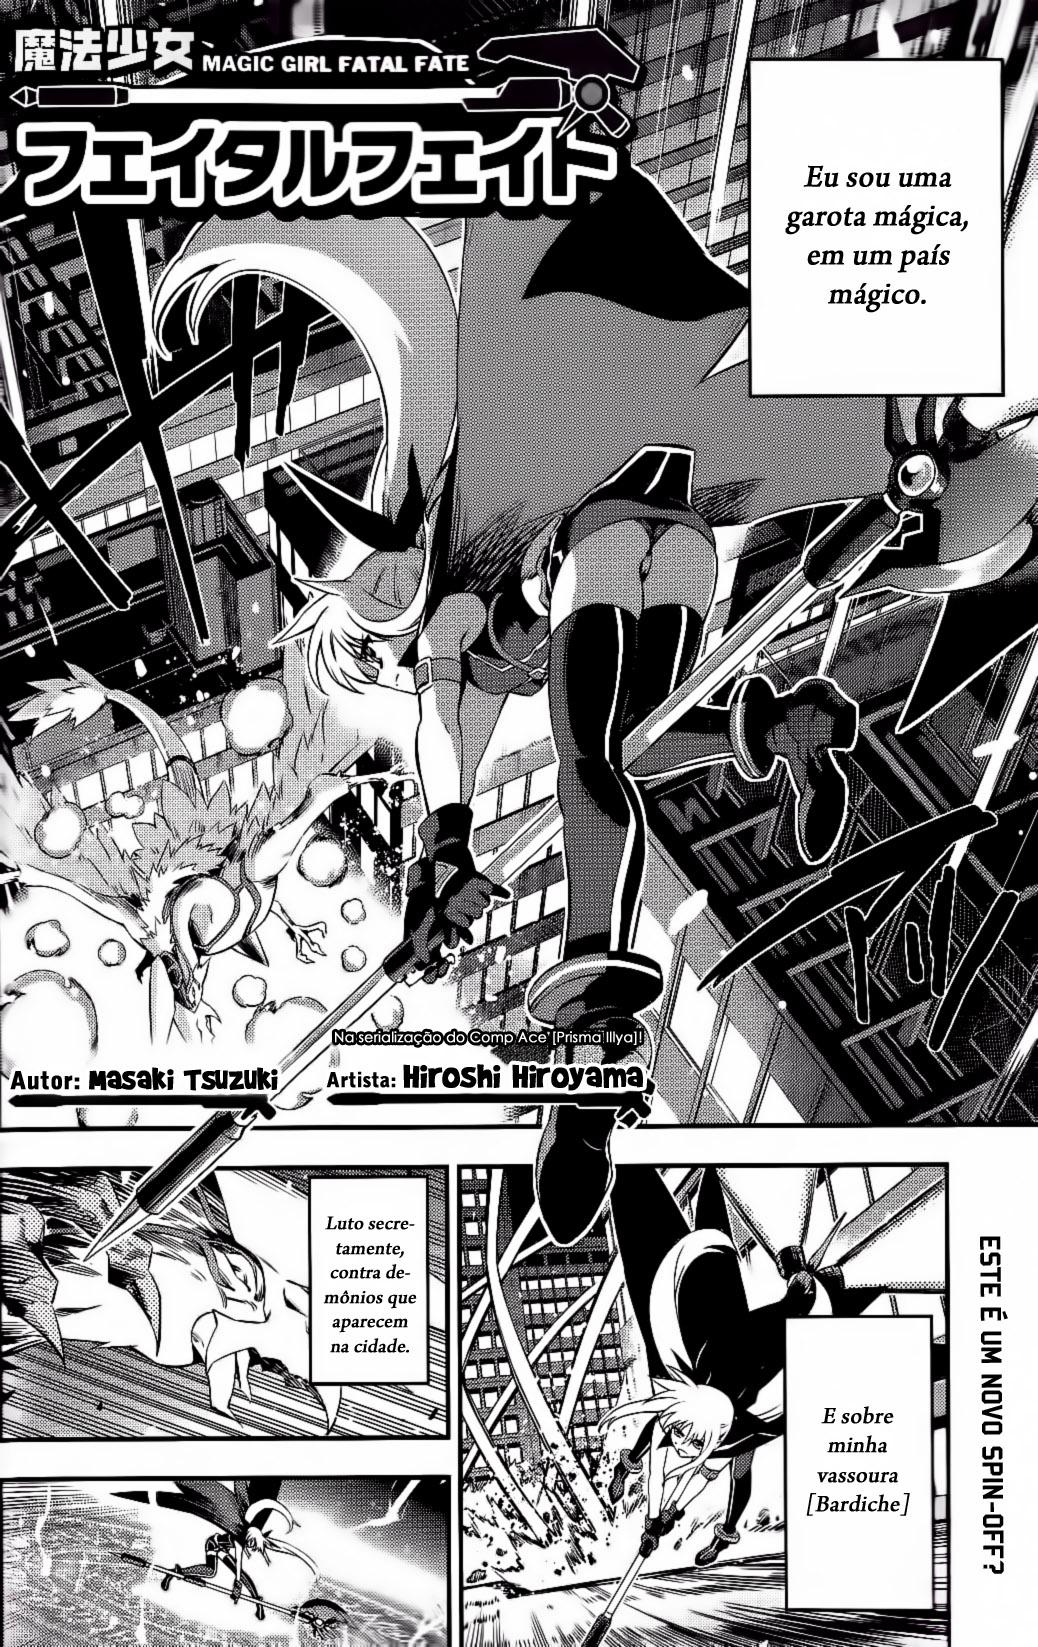 https://nine.mangadogs.com/br_manga/pic/43/6507/6497649/MahouShoujoFatalFateCapiac_1_988.jpg Page 2